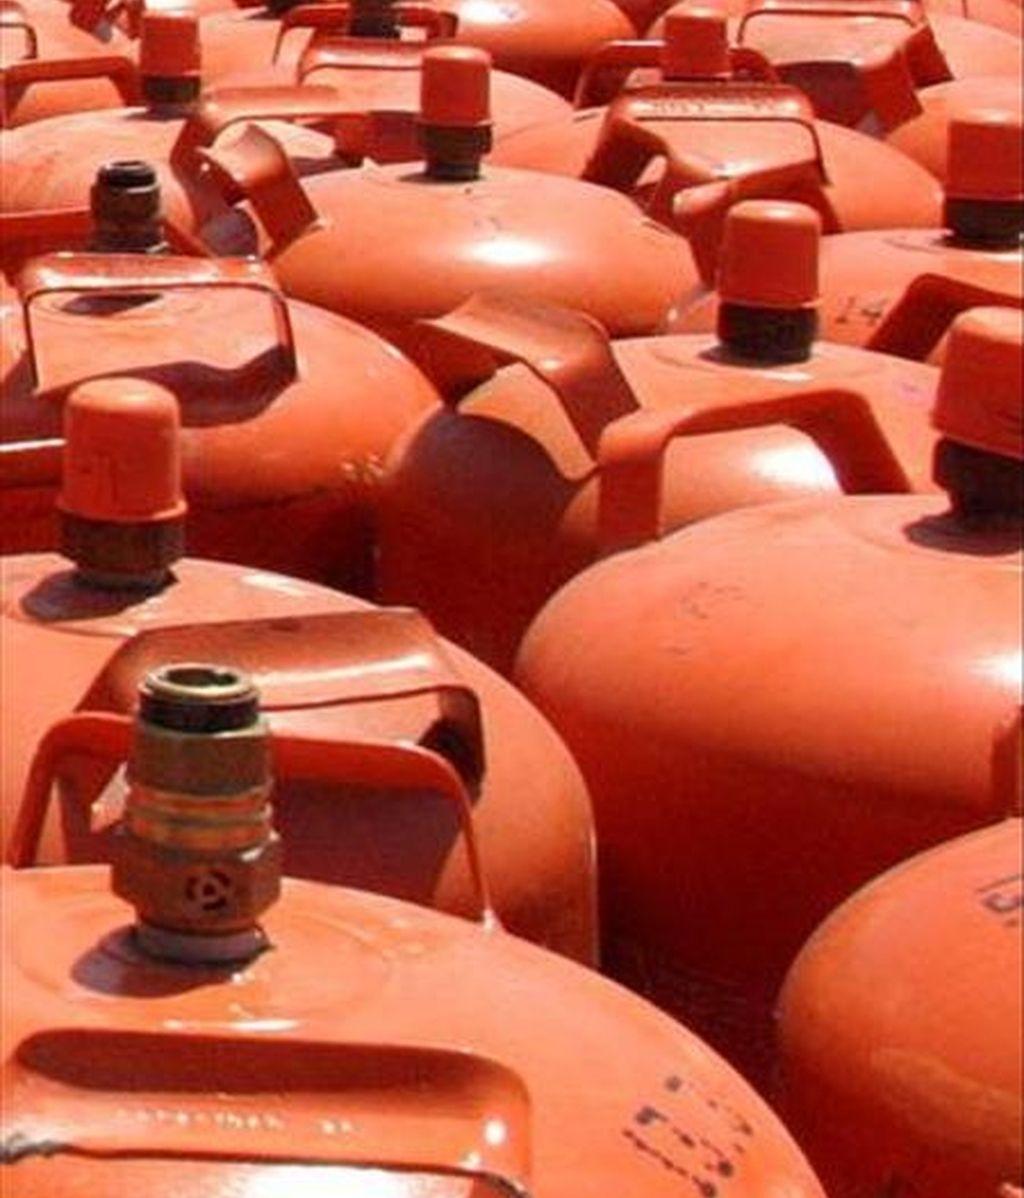 Vista de varias bombonas de butano. EFE/Archivo